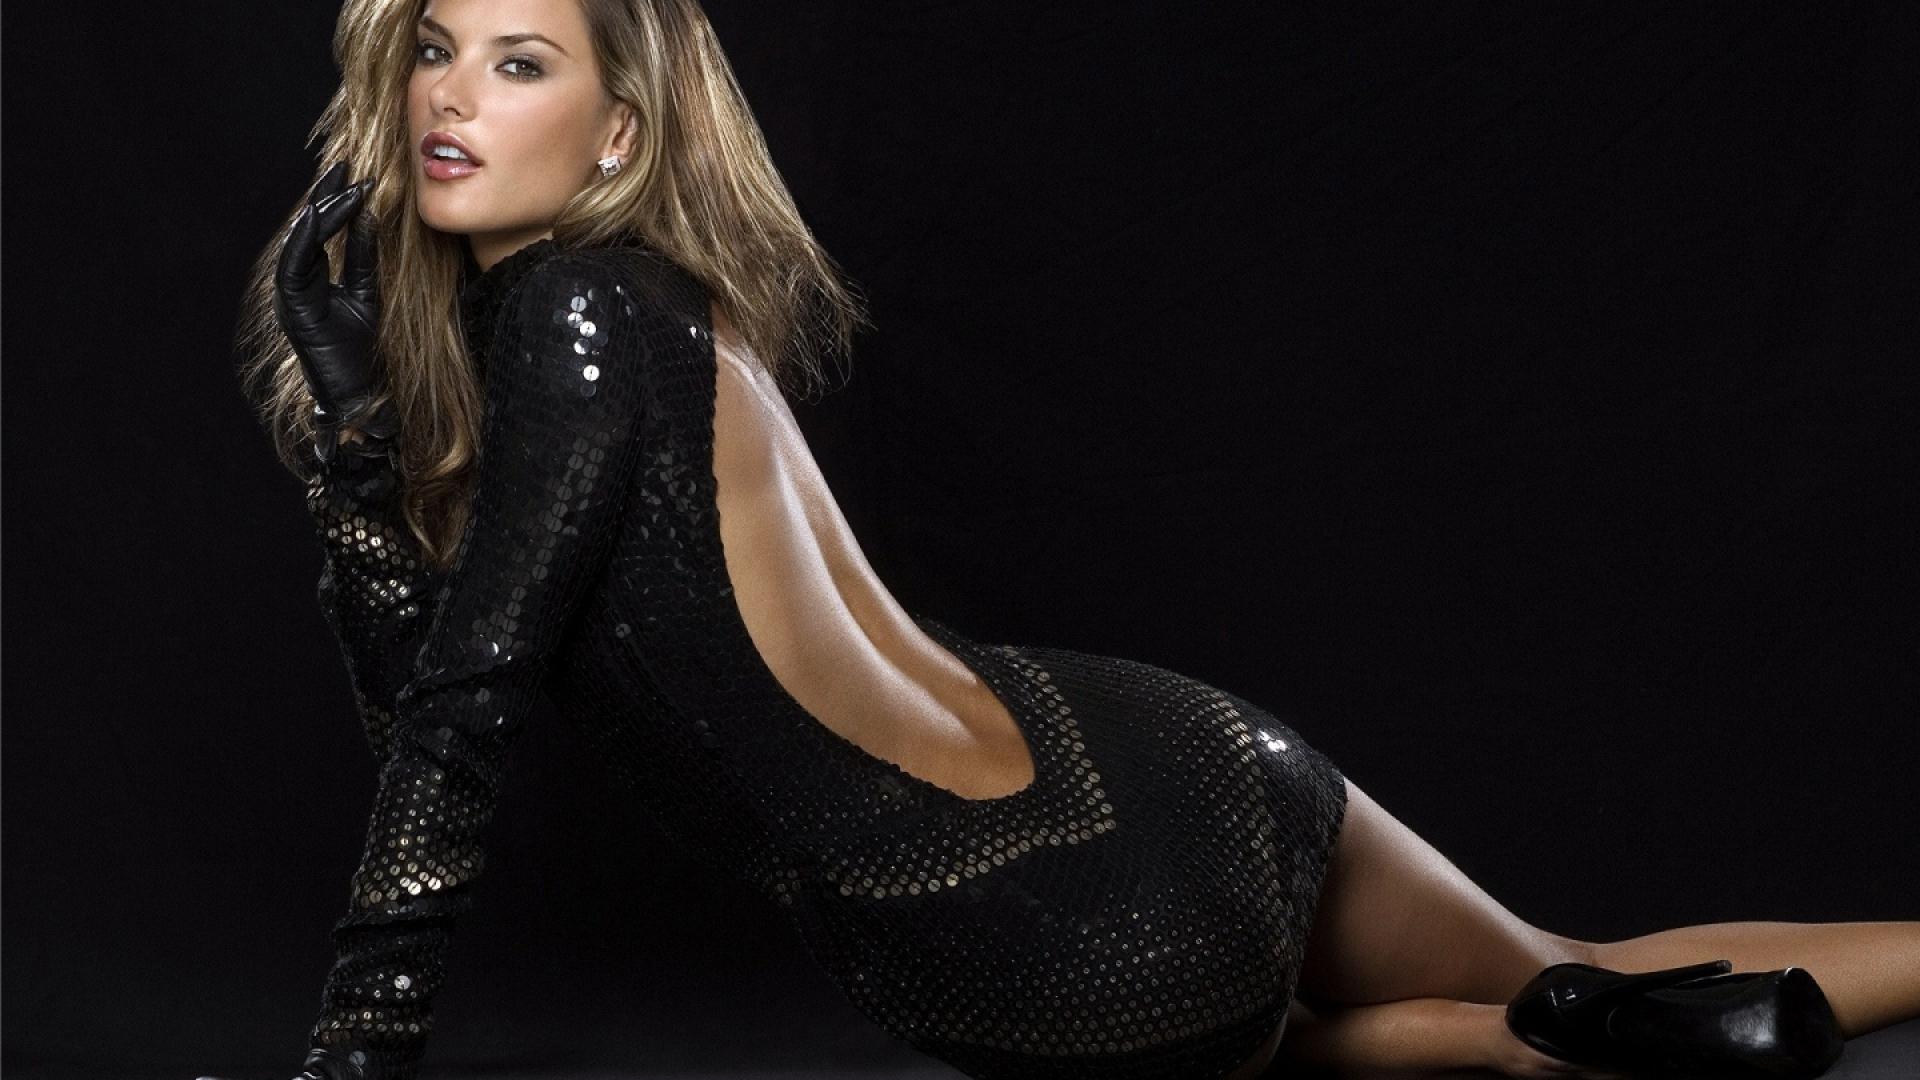 1920x1080 alessandra ambrosio hot backless dress 1080p laptop full hd wallpaper hd celebrities - Hollywood actress full hd wallpaper ...